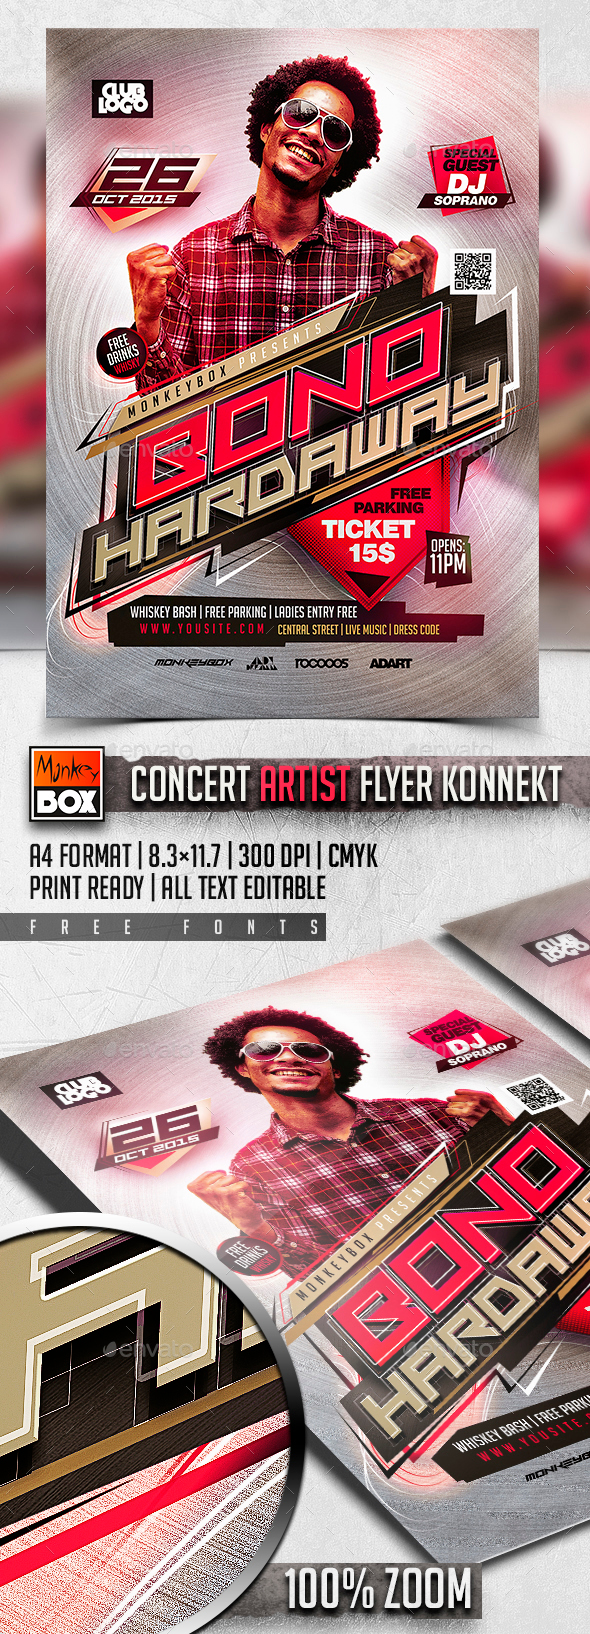 Concert Artist Flyer Konnekt - Events Flyers